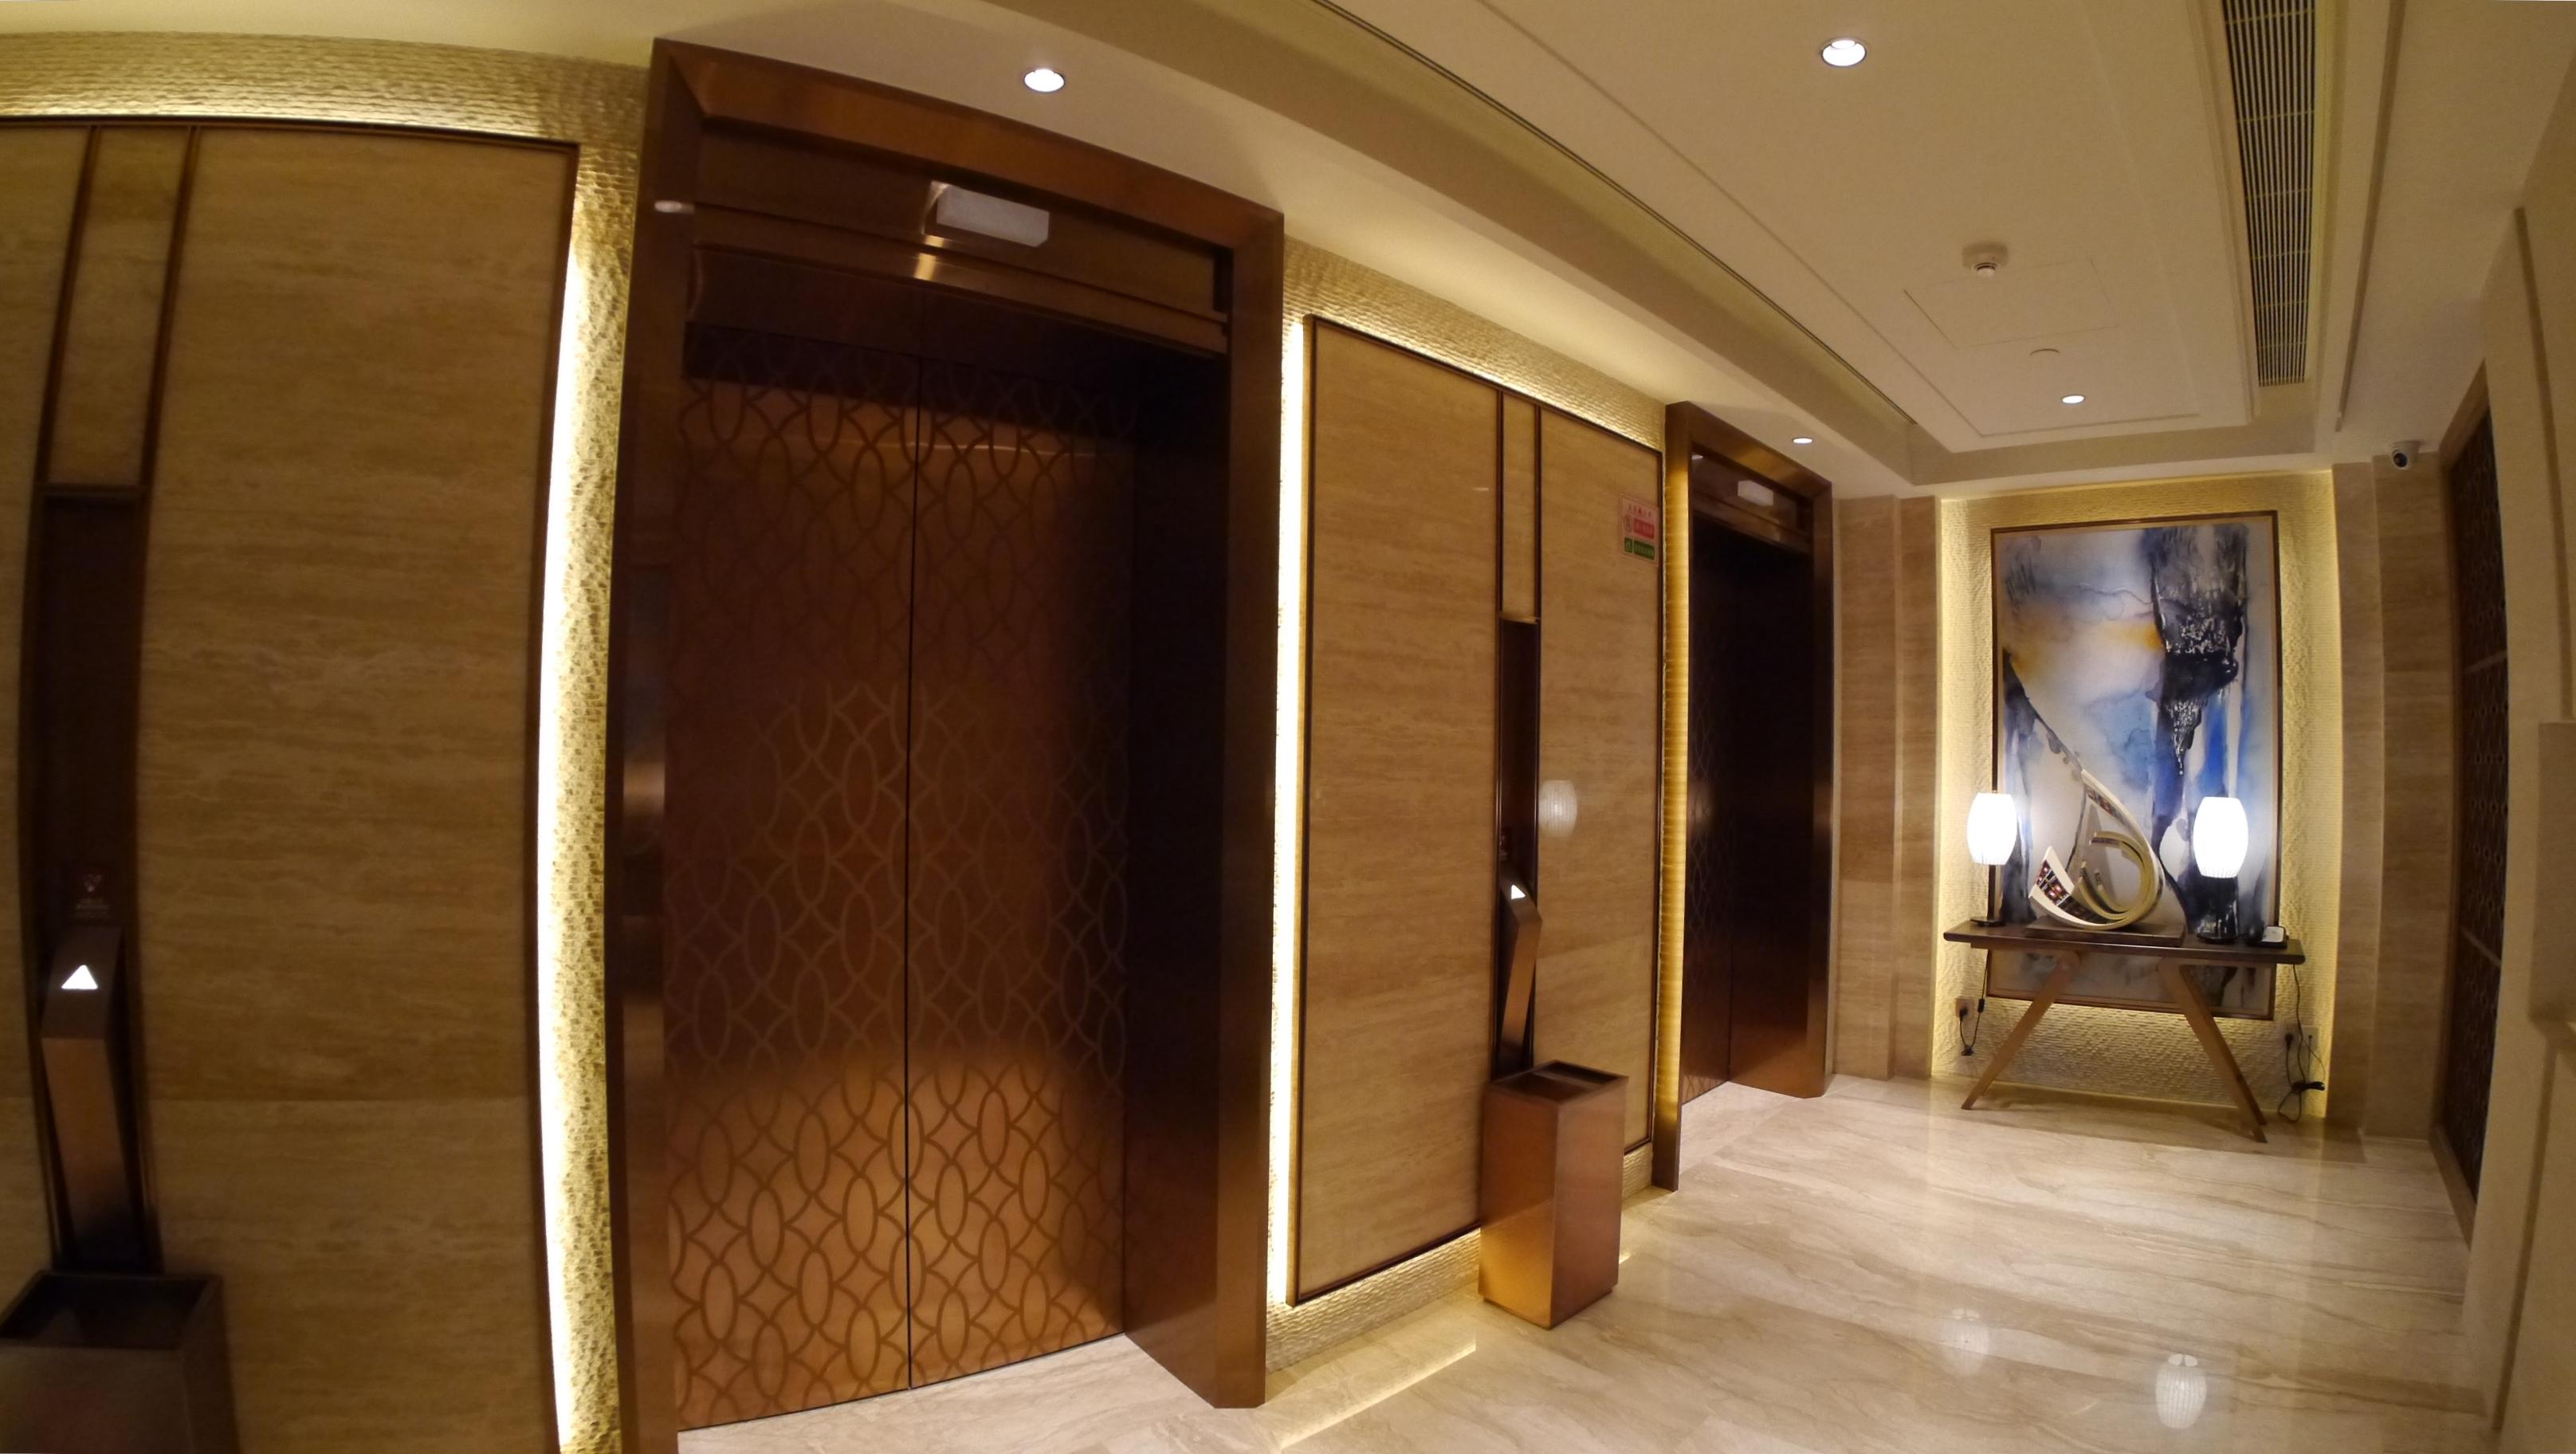 Socialight 8 Hilton Fuxian Lake Lift Lobby 1